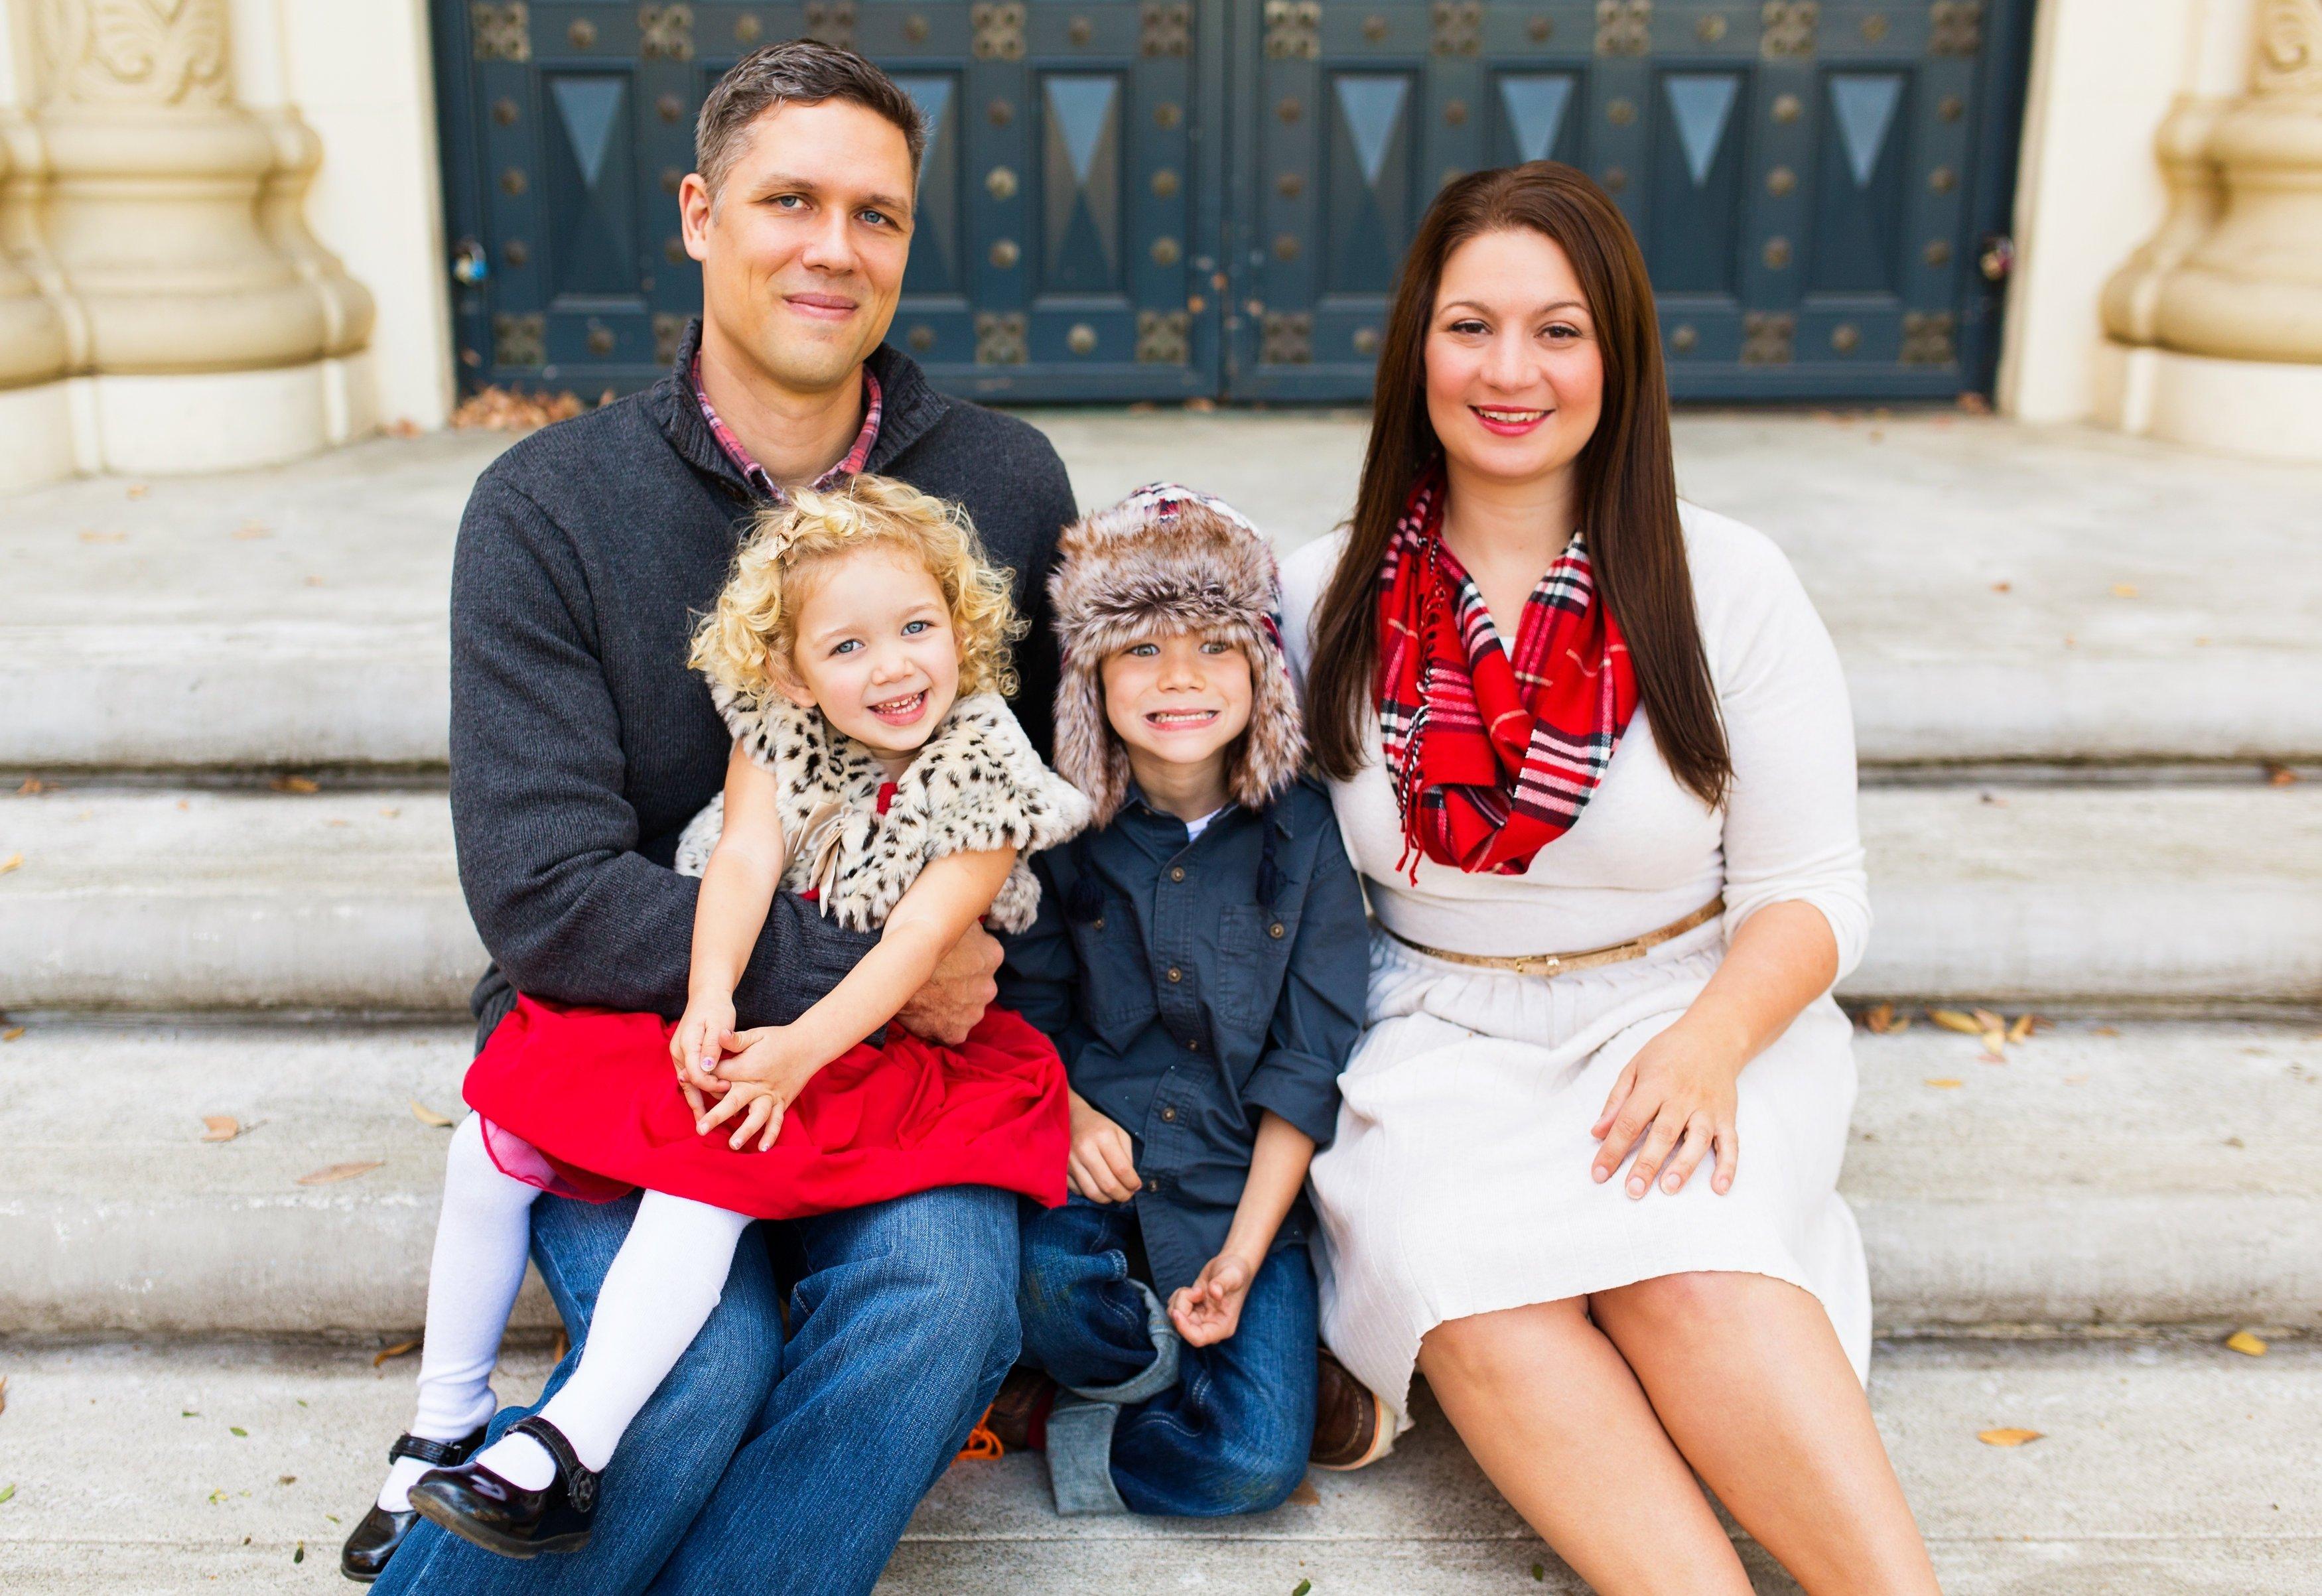 10 Most Popular Family Christmas Picture Outfit Ideas november 2013 princess nebraska 2020